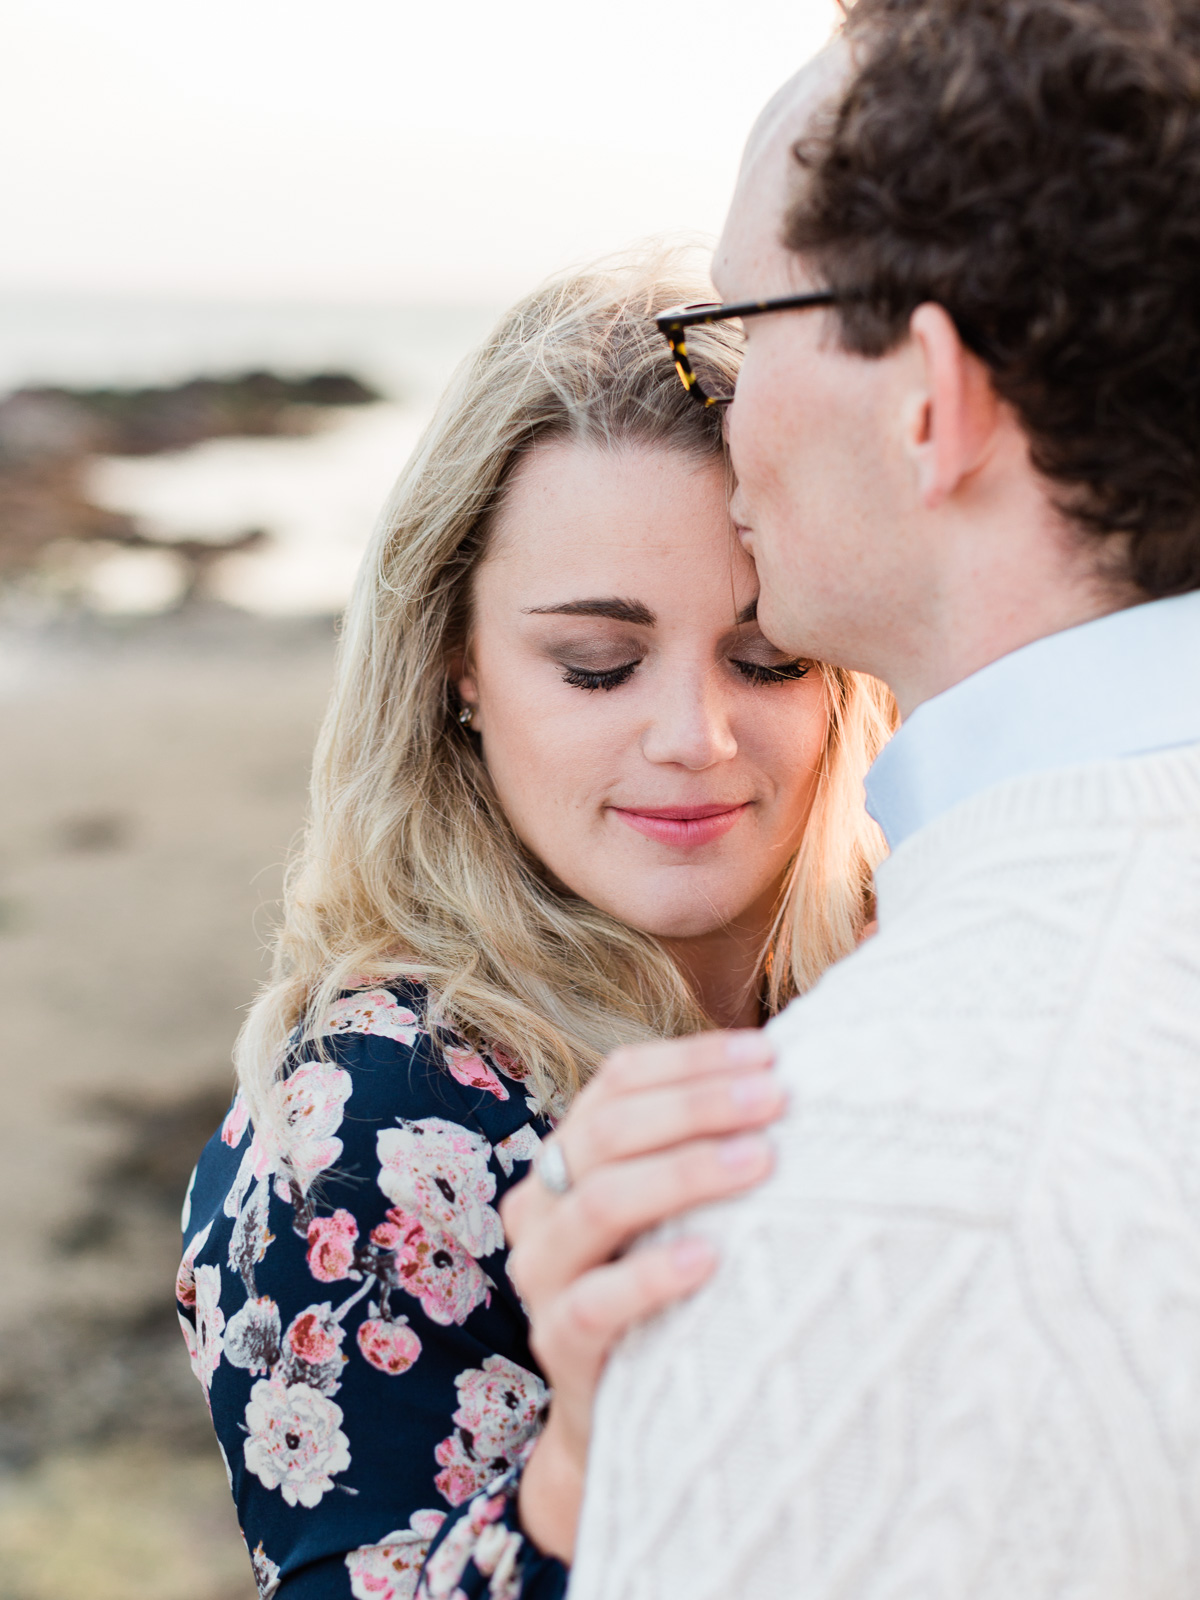 Romantic & Joyful Engagement Photos at Lighthouse Point Park-9.jpg